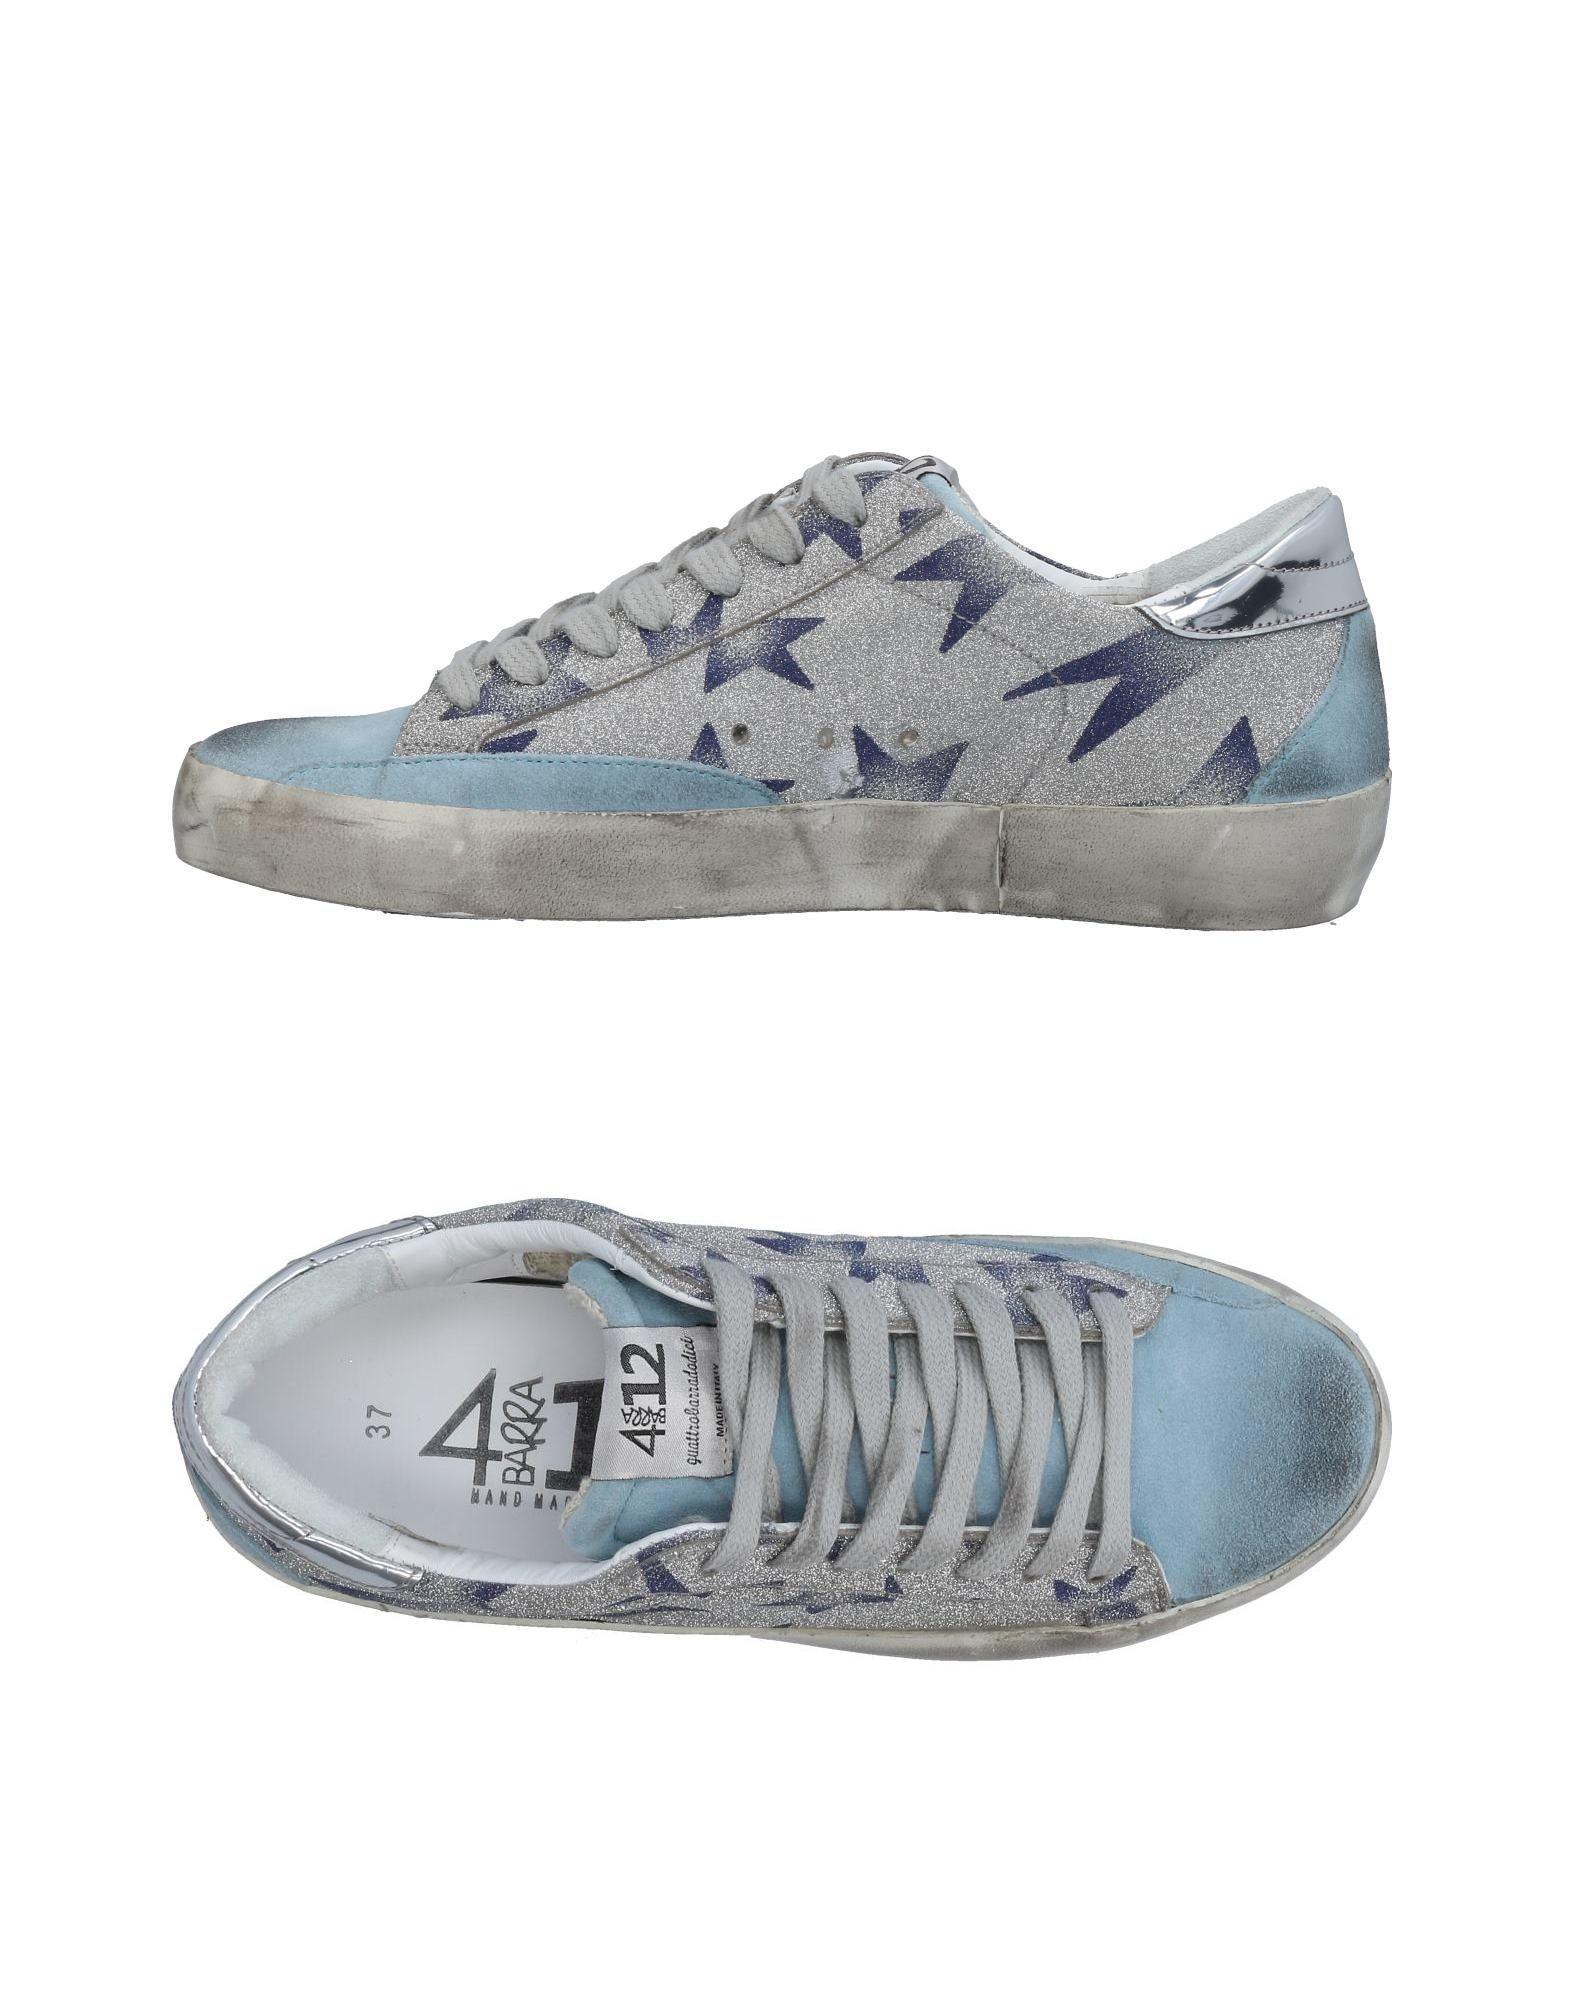 Quattrobarradodici Sneakers Damen  11459571OH Gute Qualität beliebte Schuhe